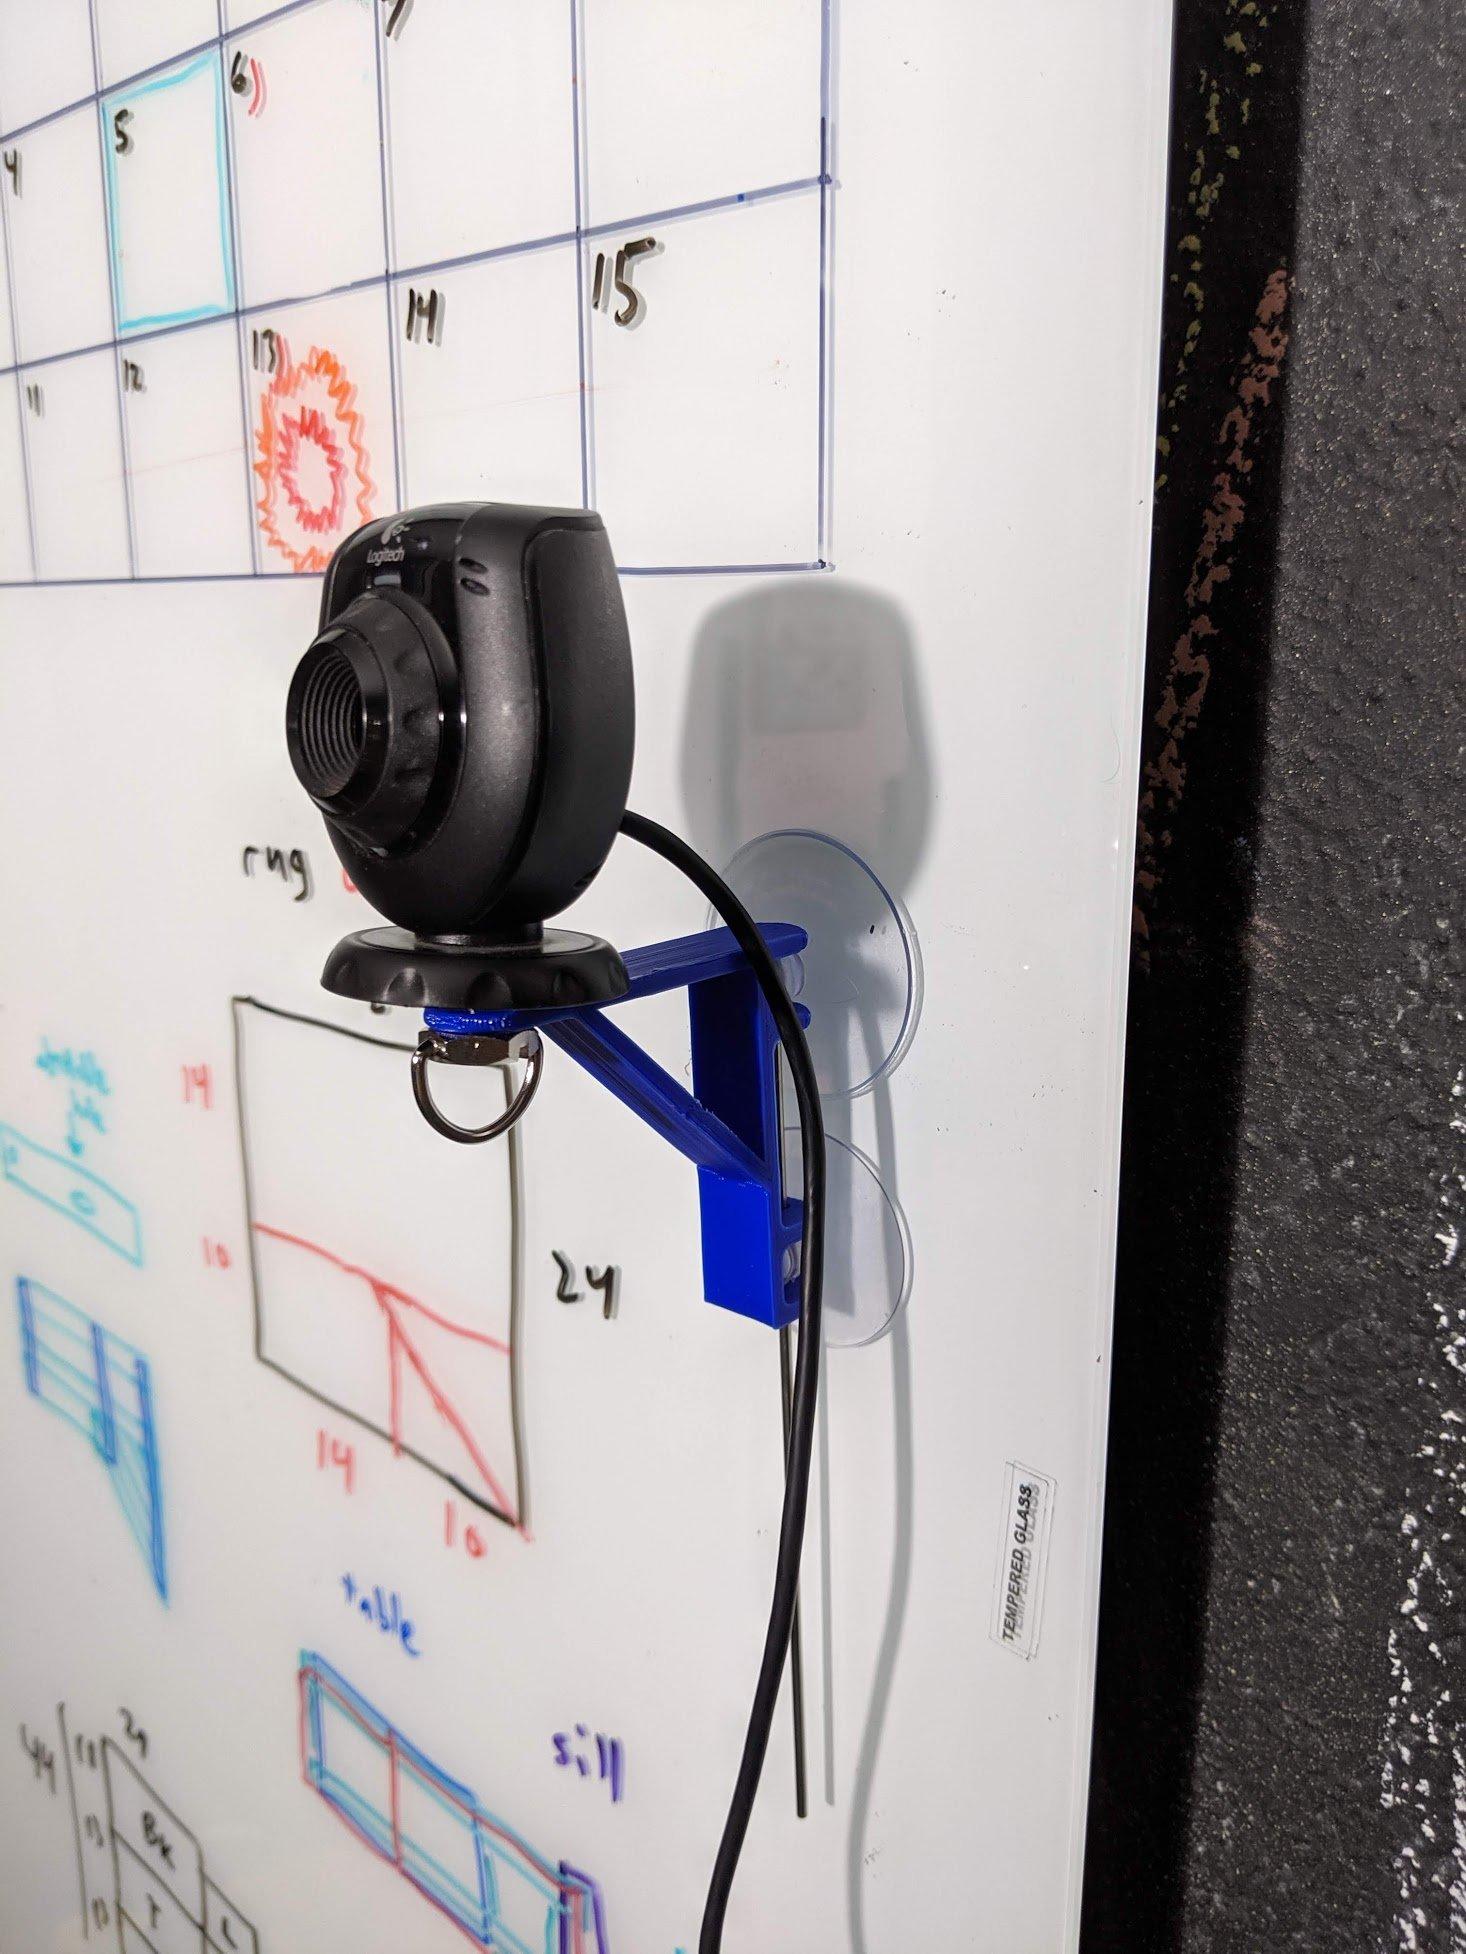 Web cam suction cup mount